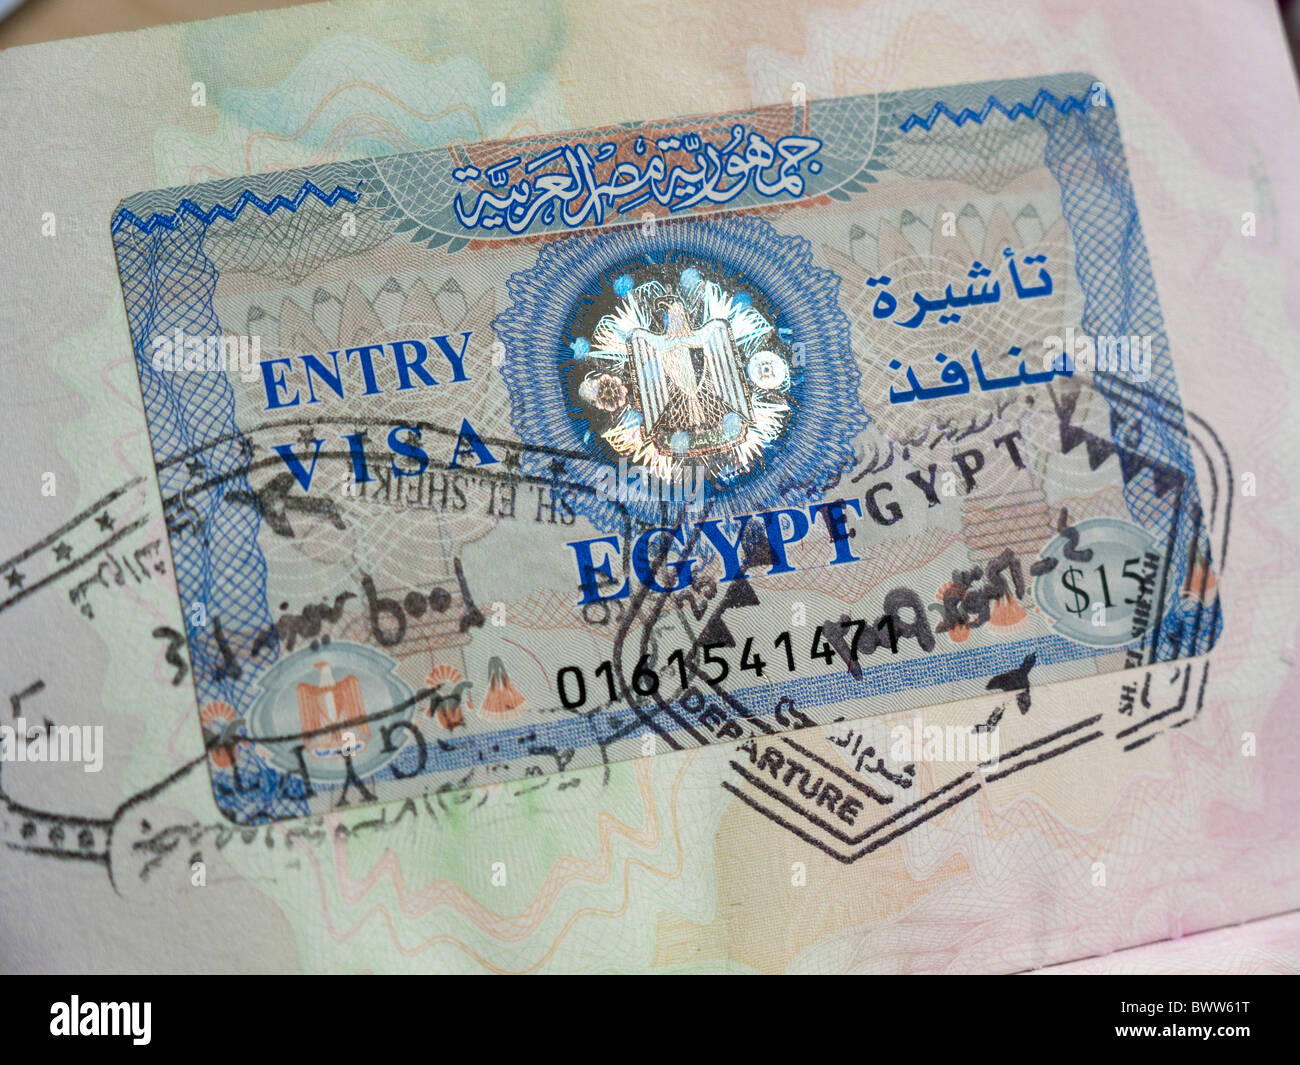 Egyptian visa in a passport - Stock Image